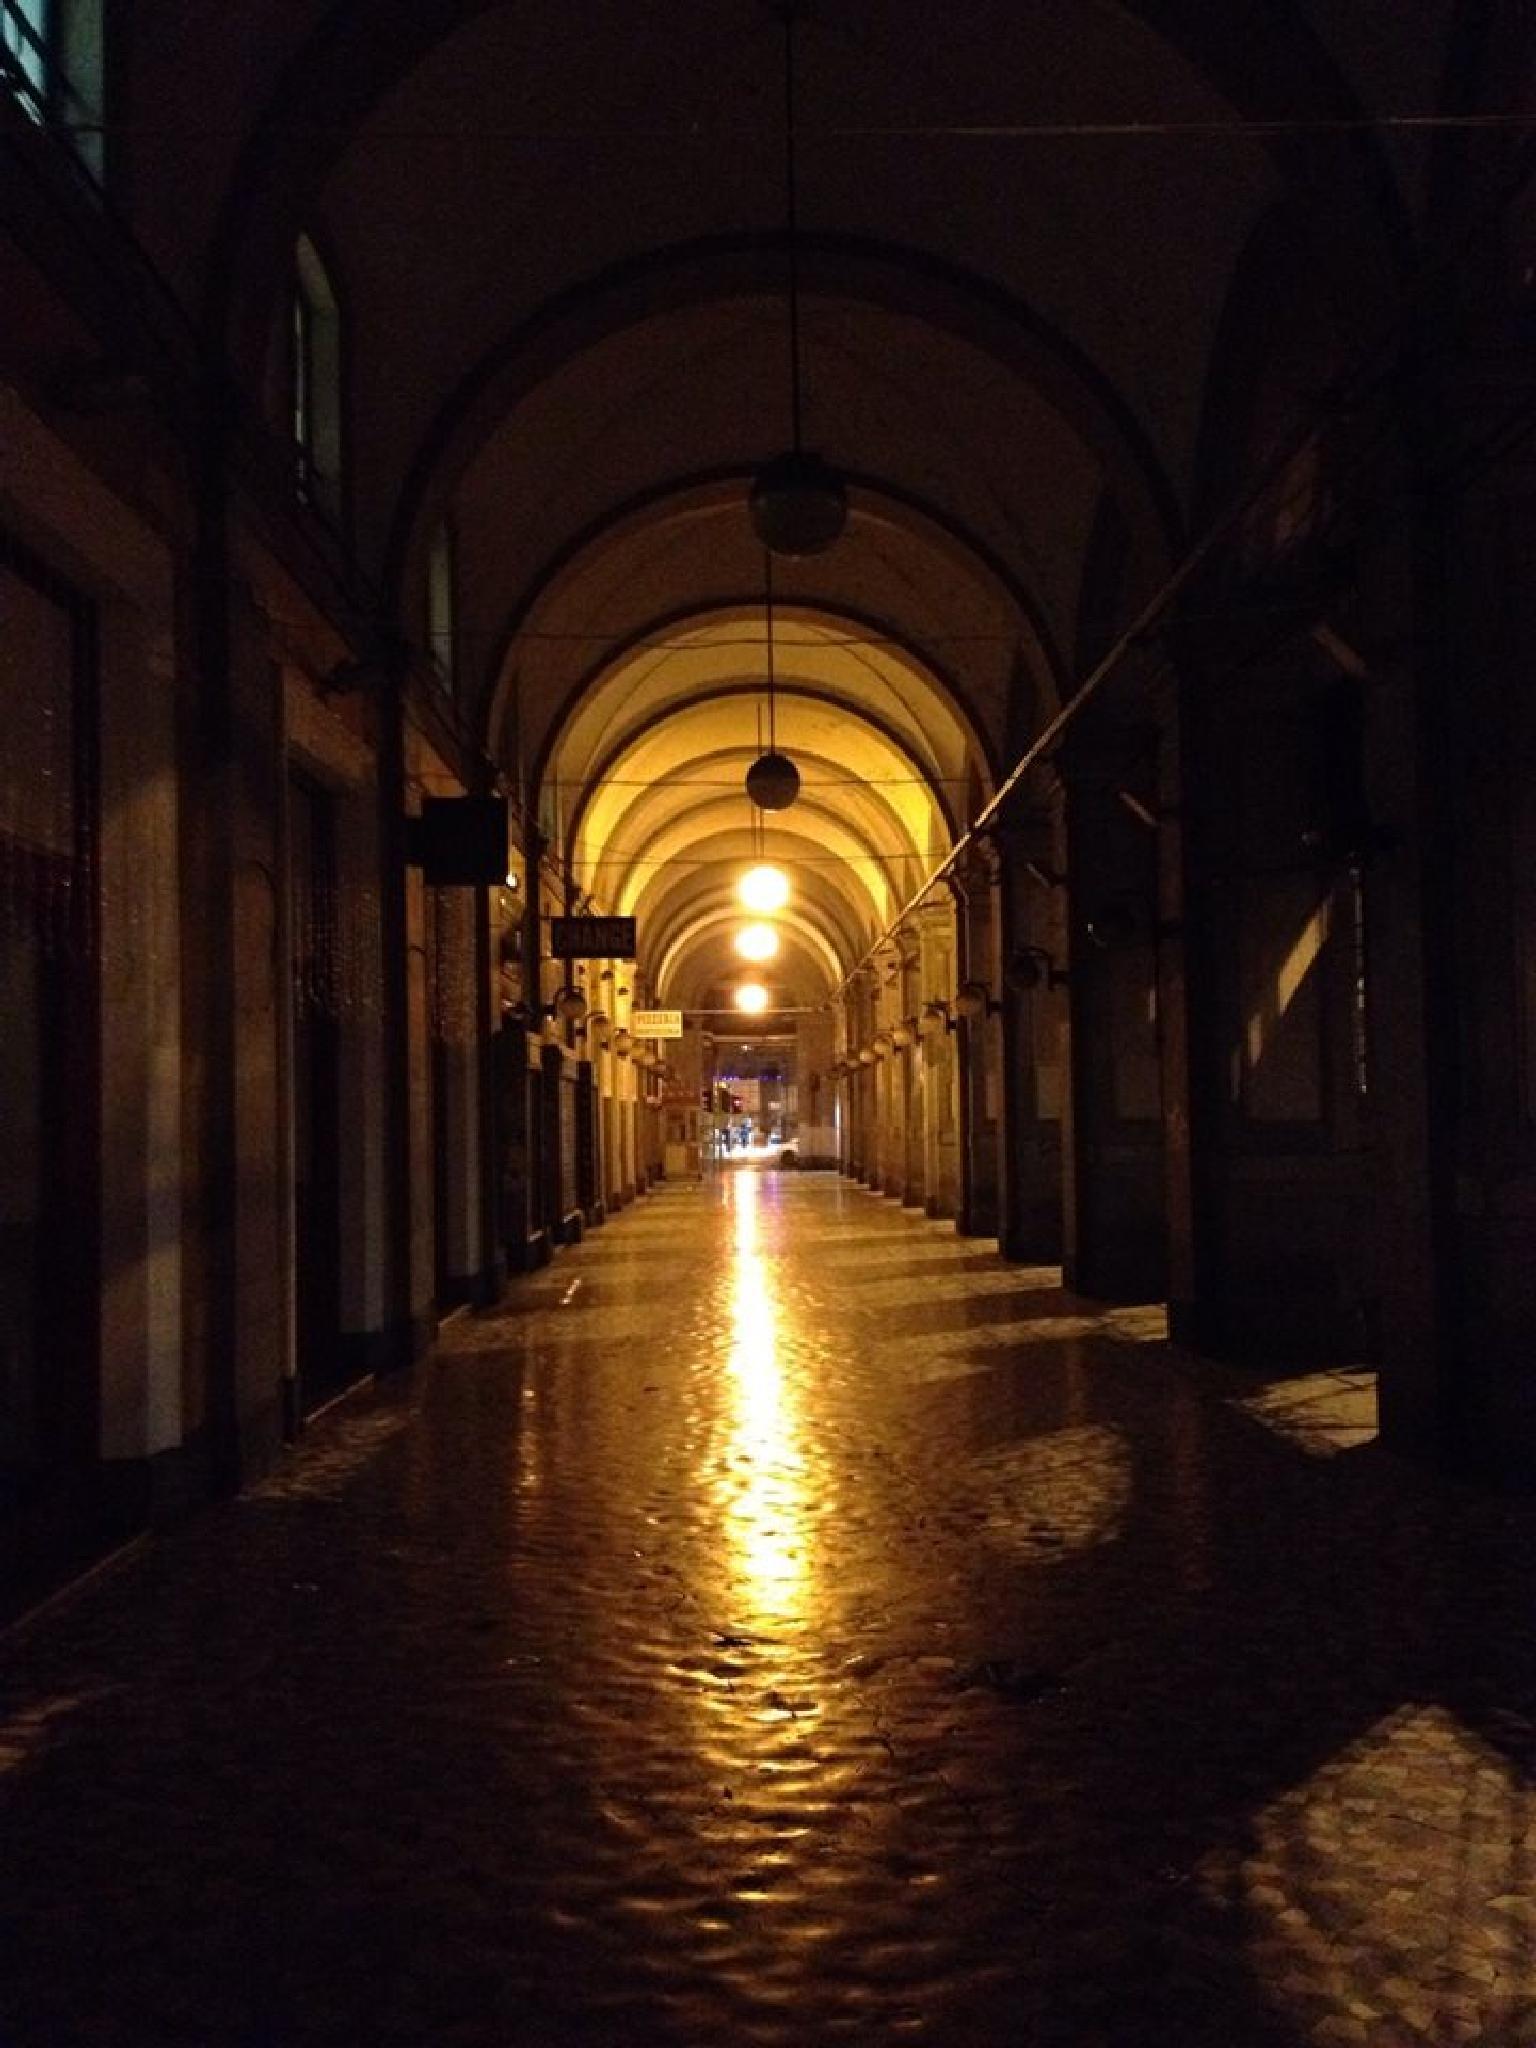 The City's still sleeping, Rome. by grossiroma